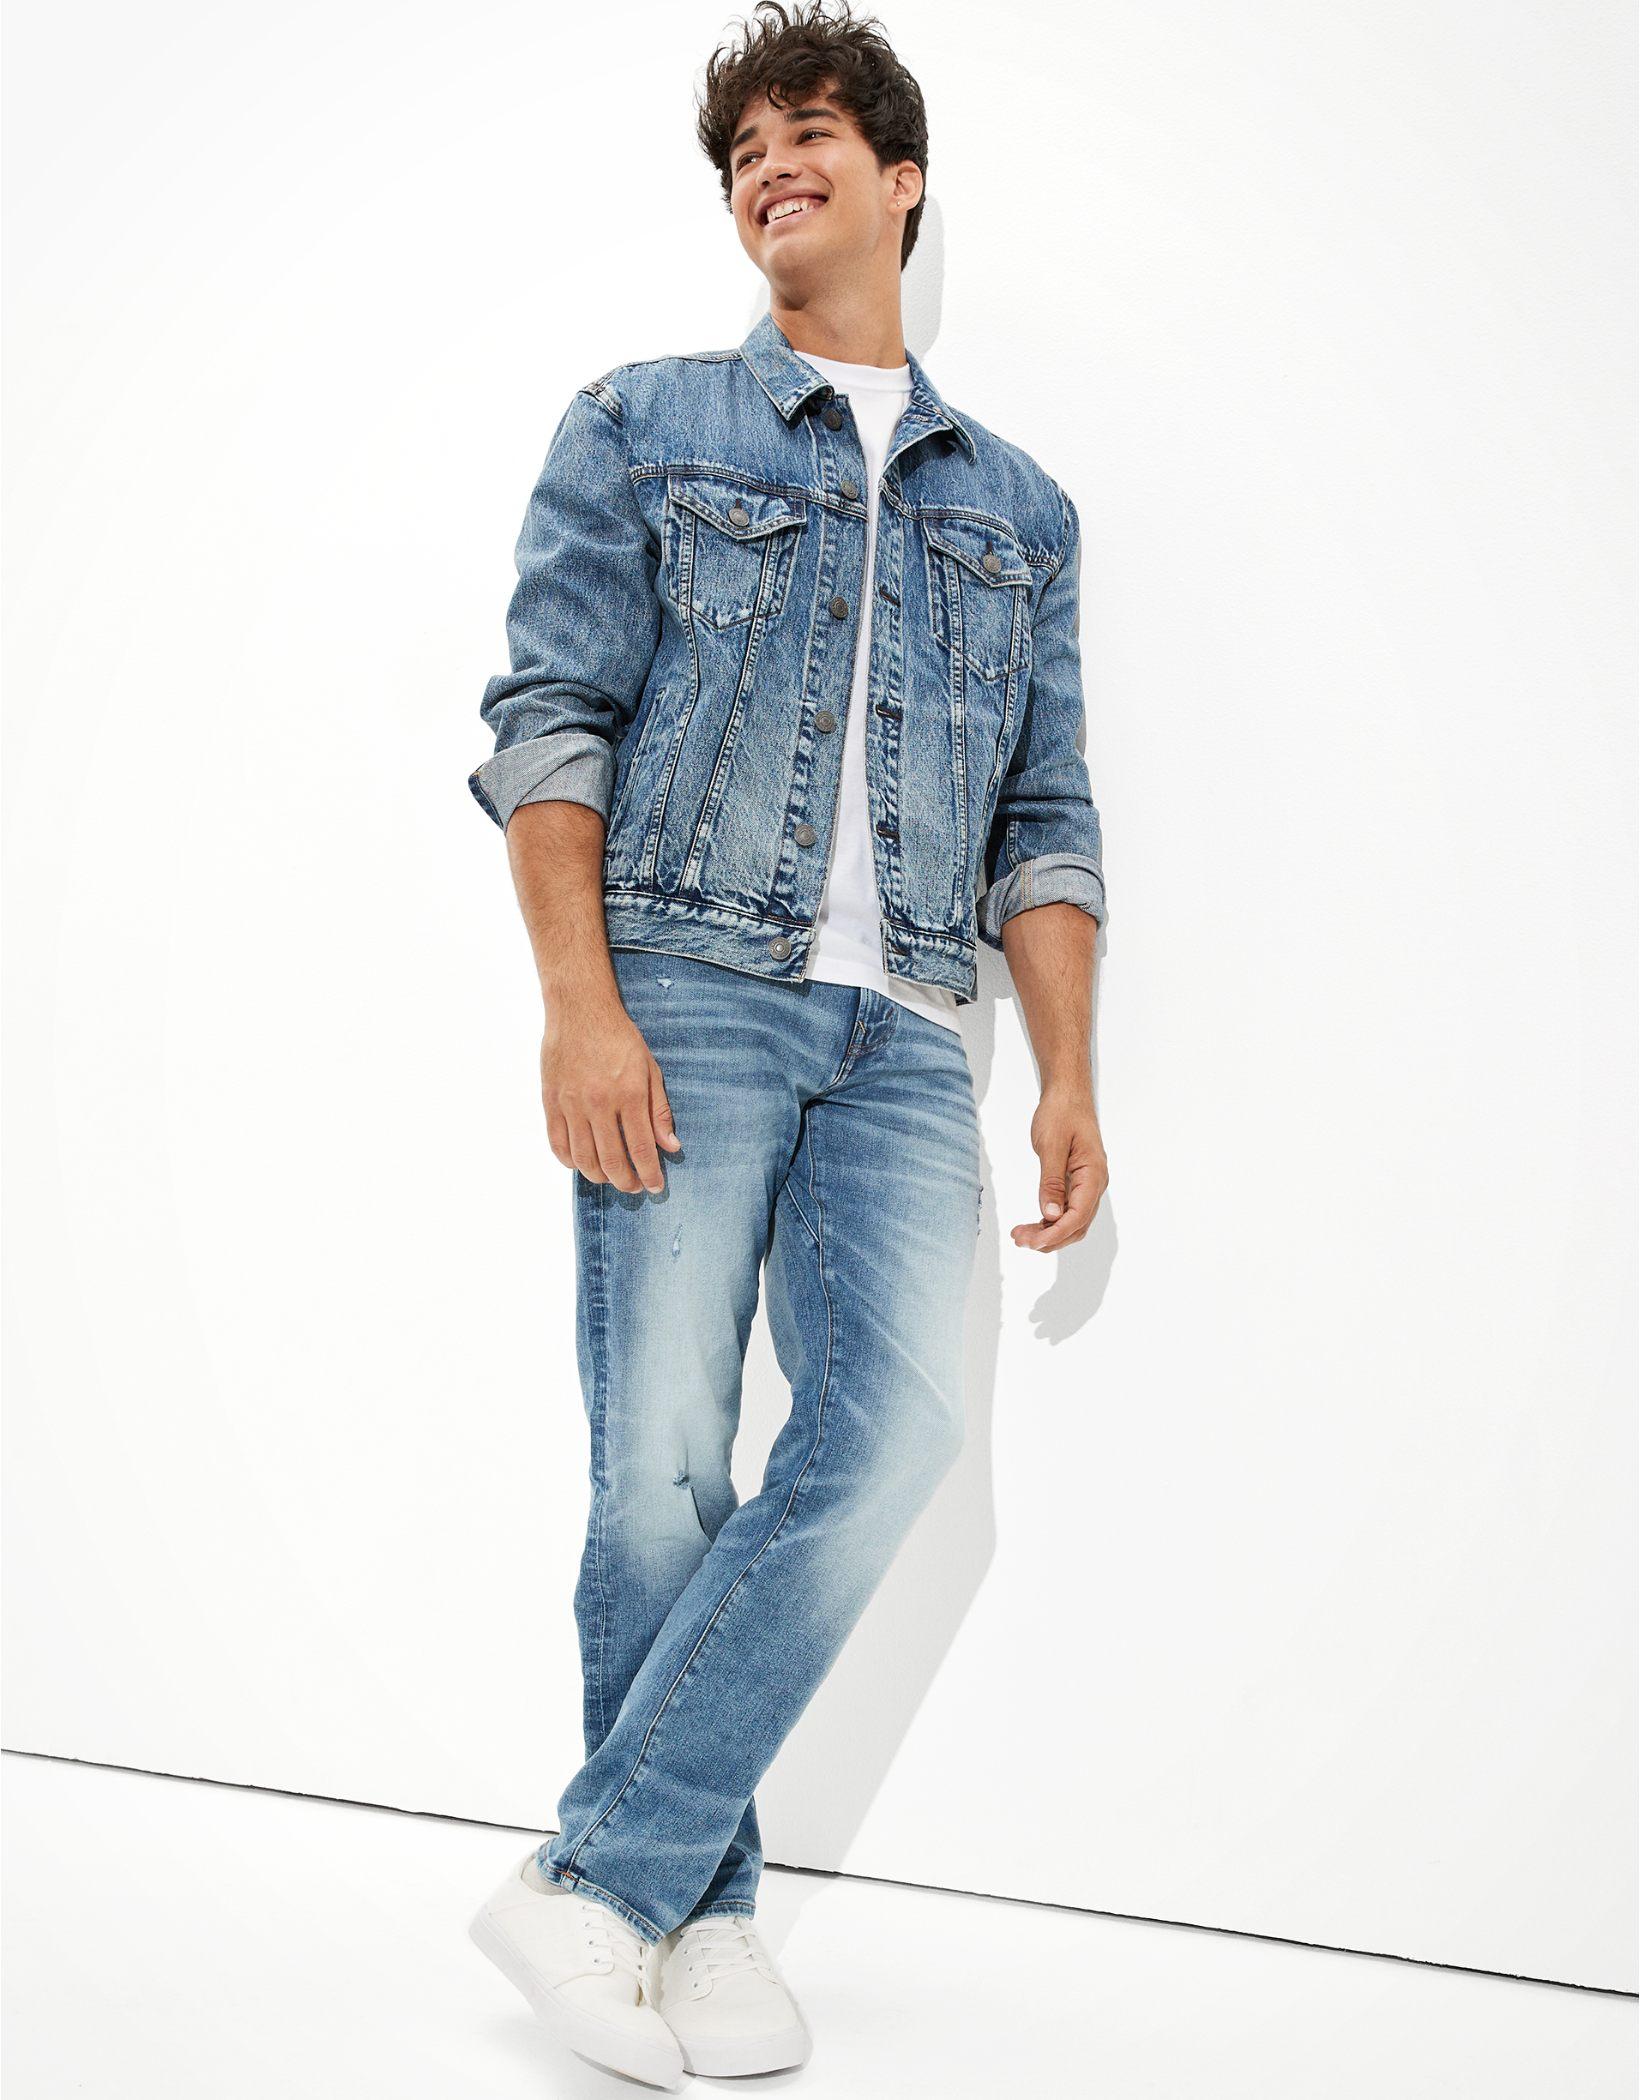 AE AirFlex+ Ripped Move-Free Slim Straight Jean